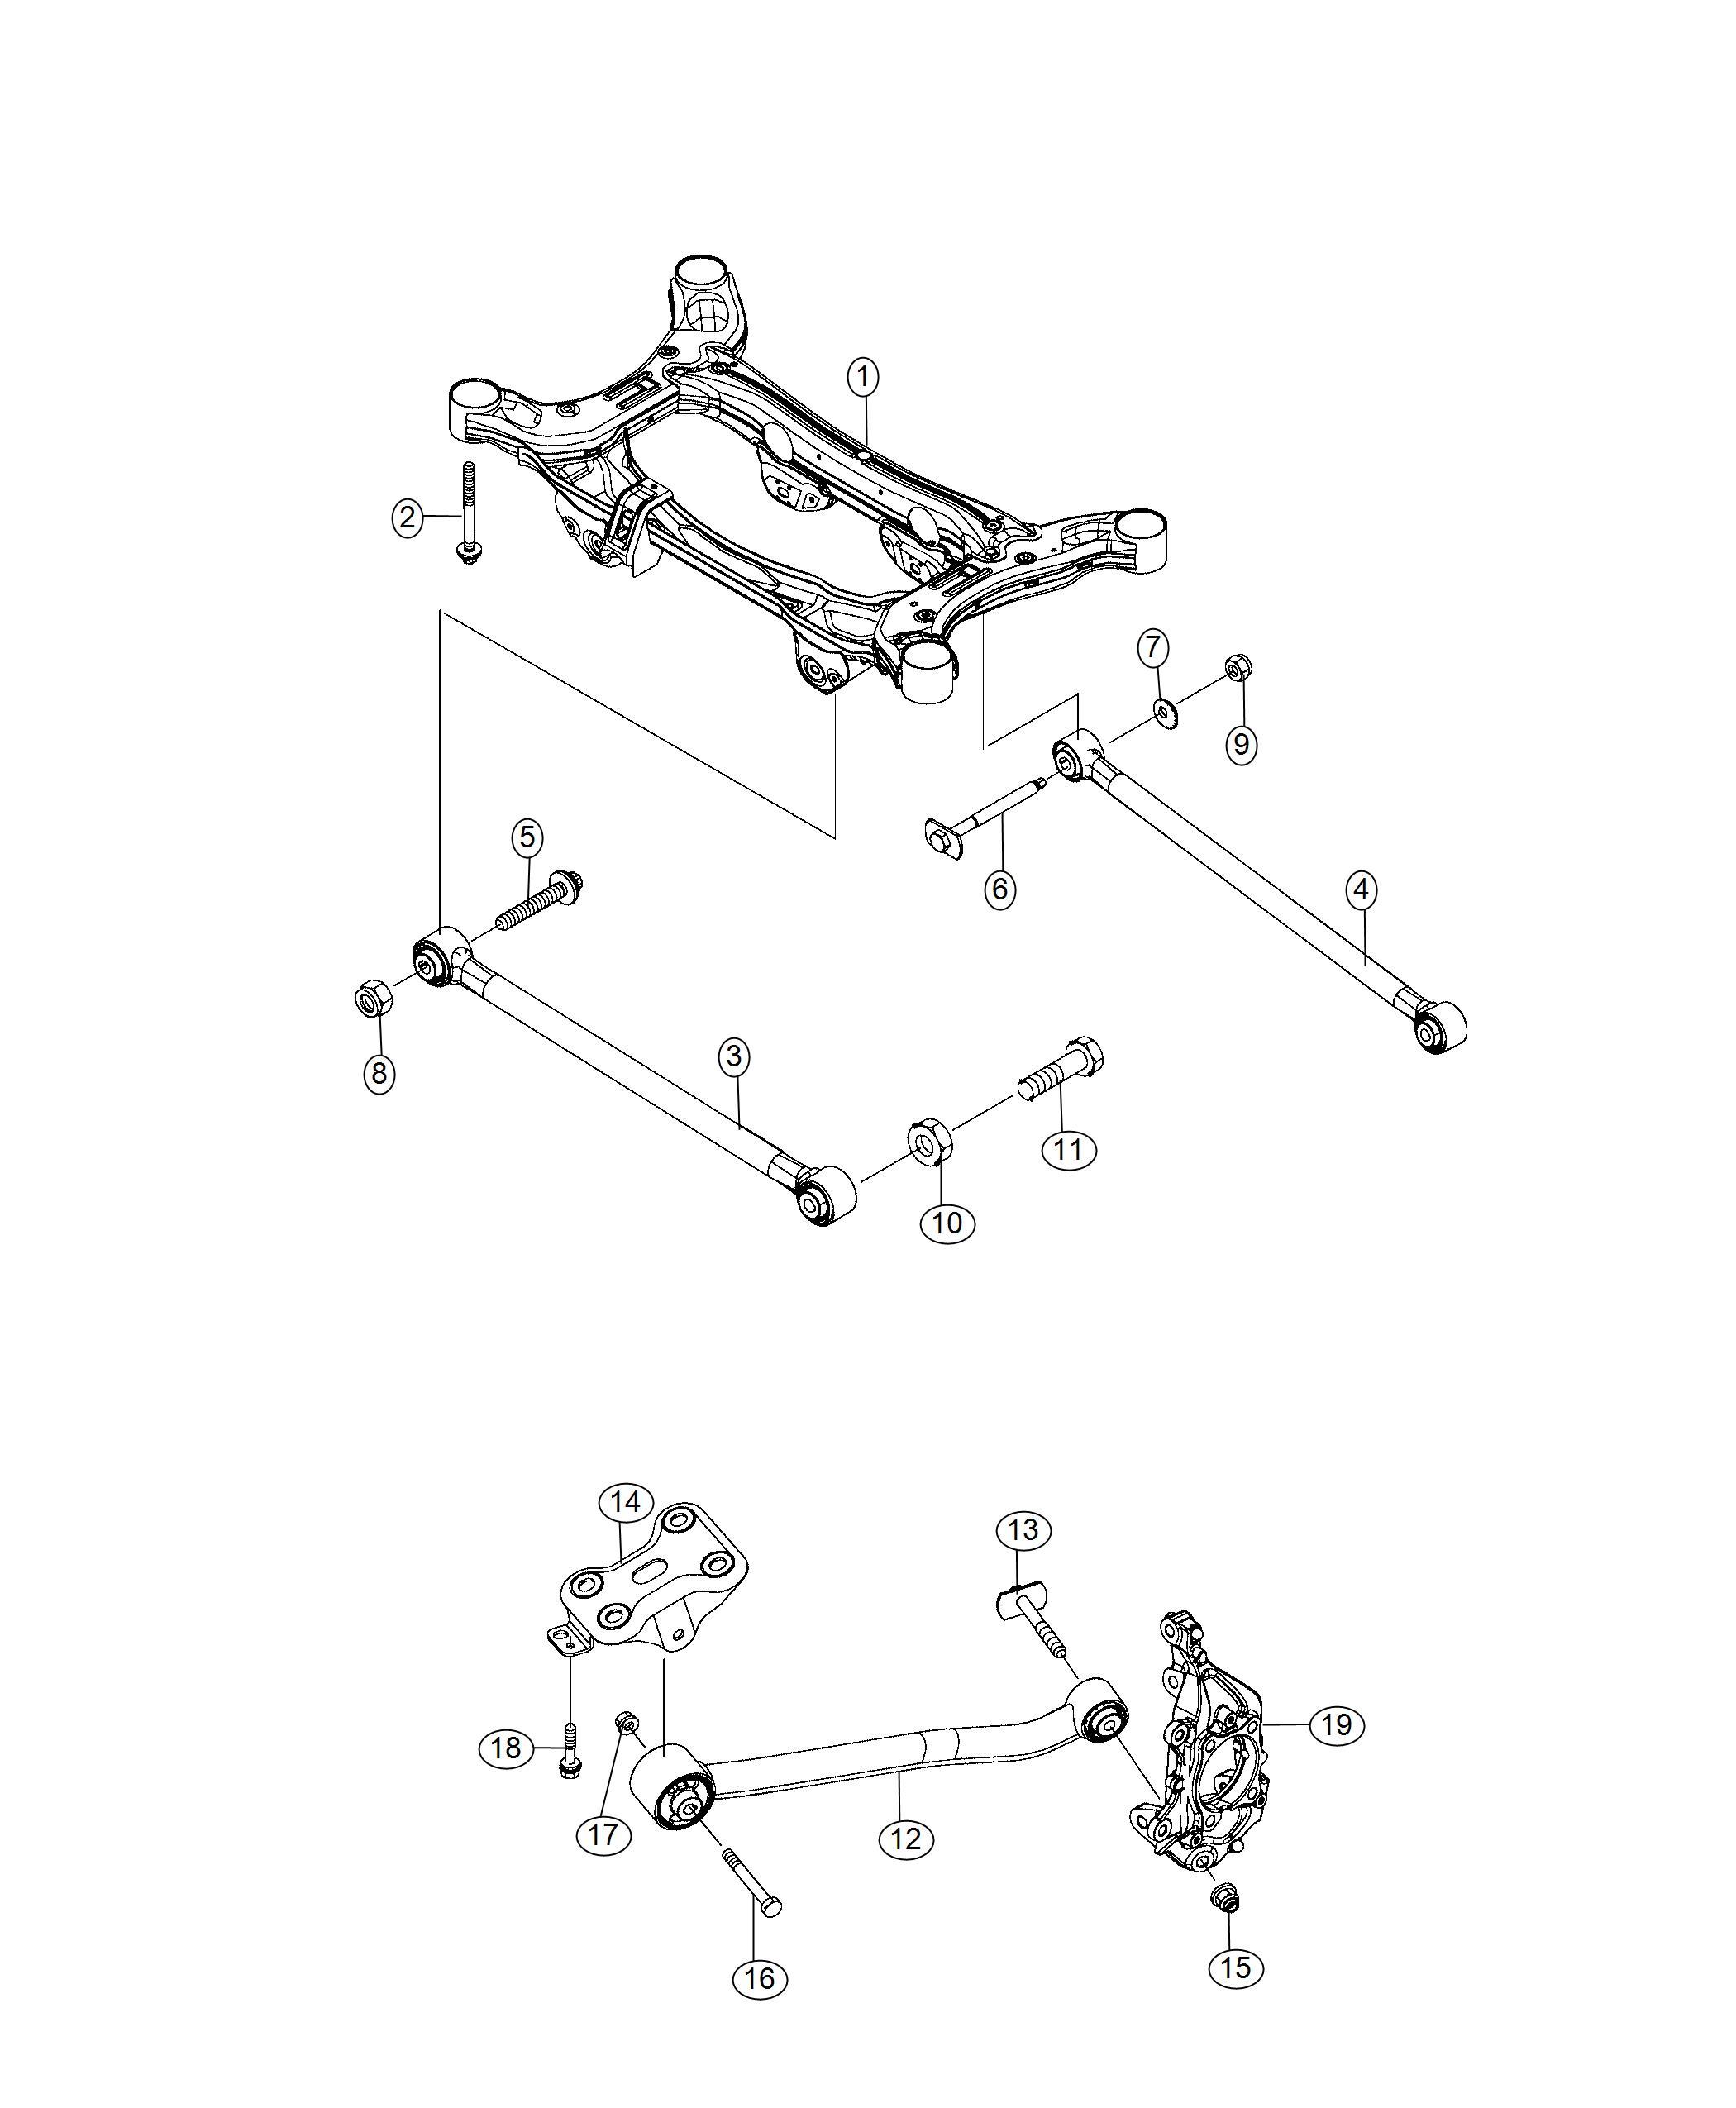 Jeep Compass Guide rod. Suspension. Rear. [rear suspension